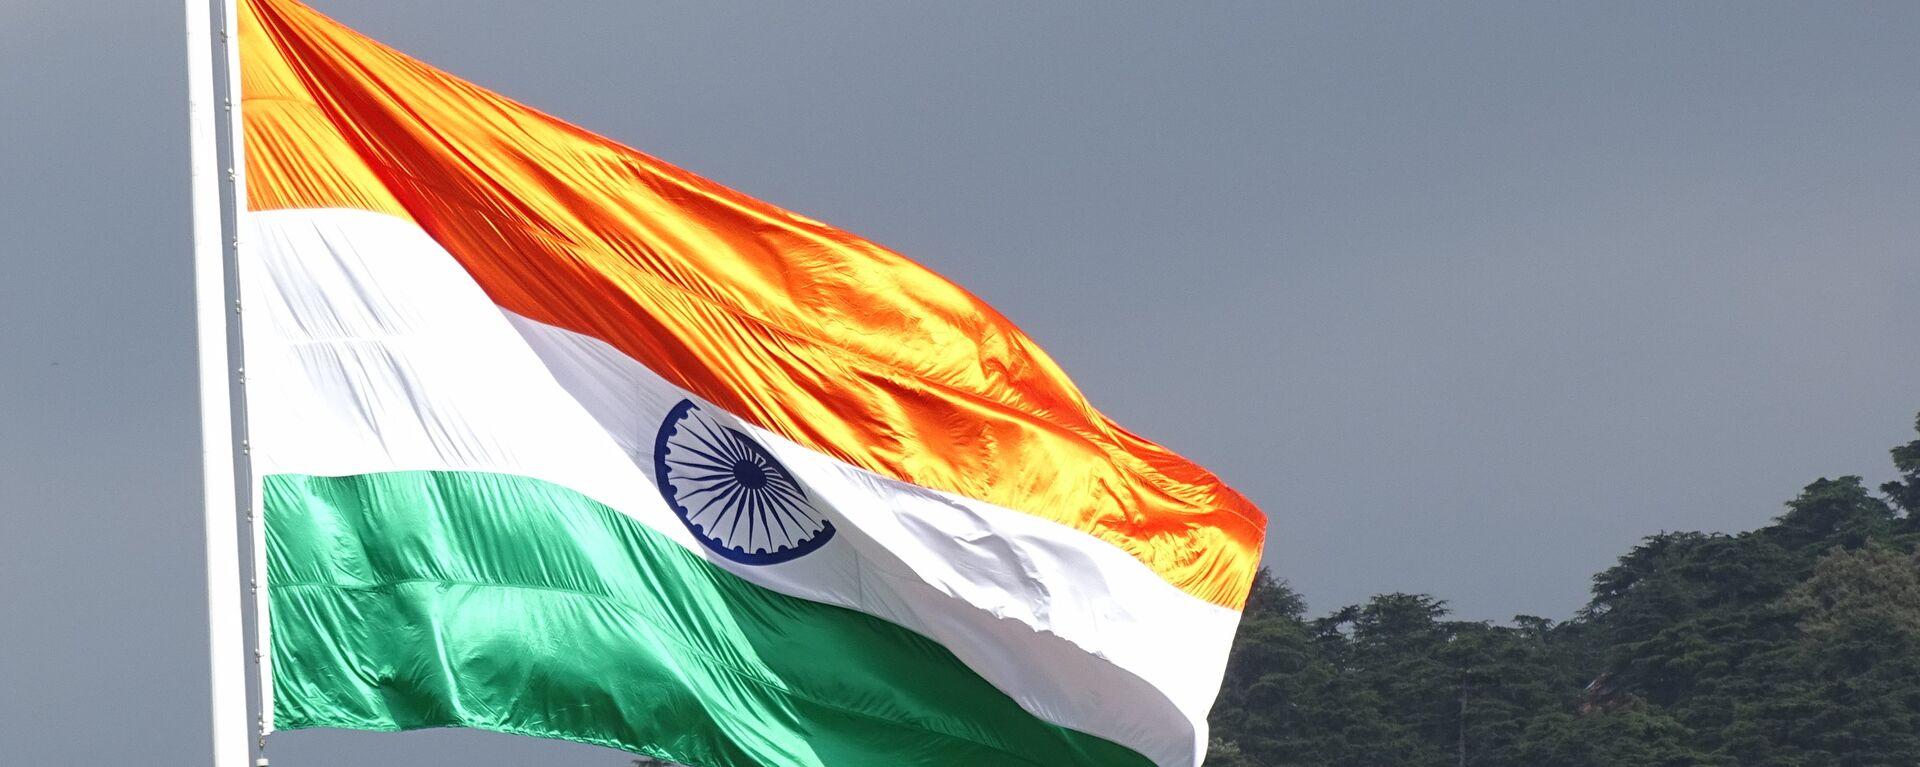 Bandera de la India - Sputnik Mundo, 1920, 06.09.2021